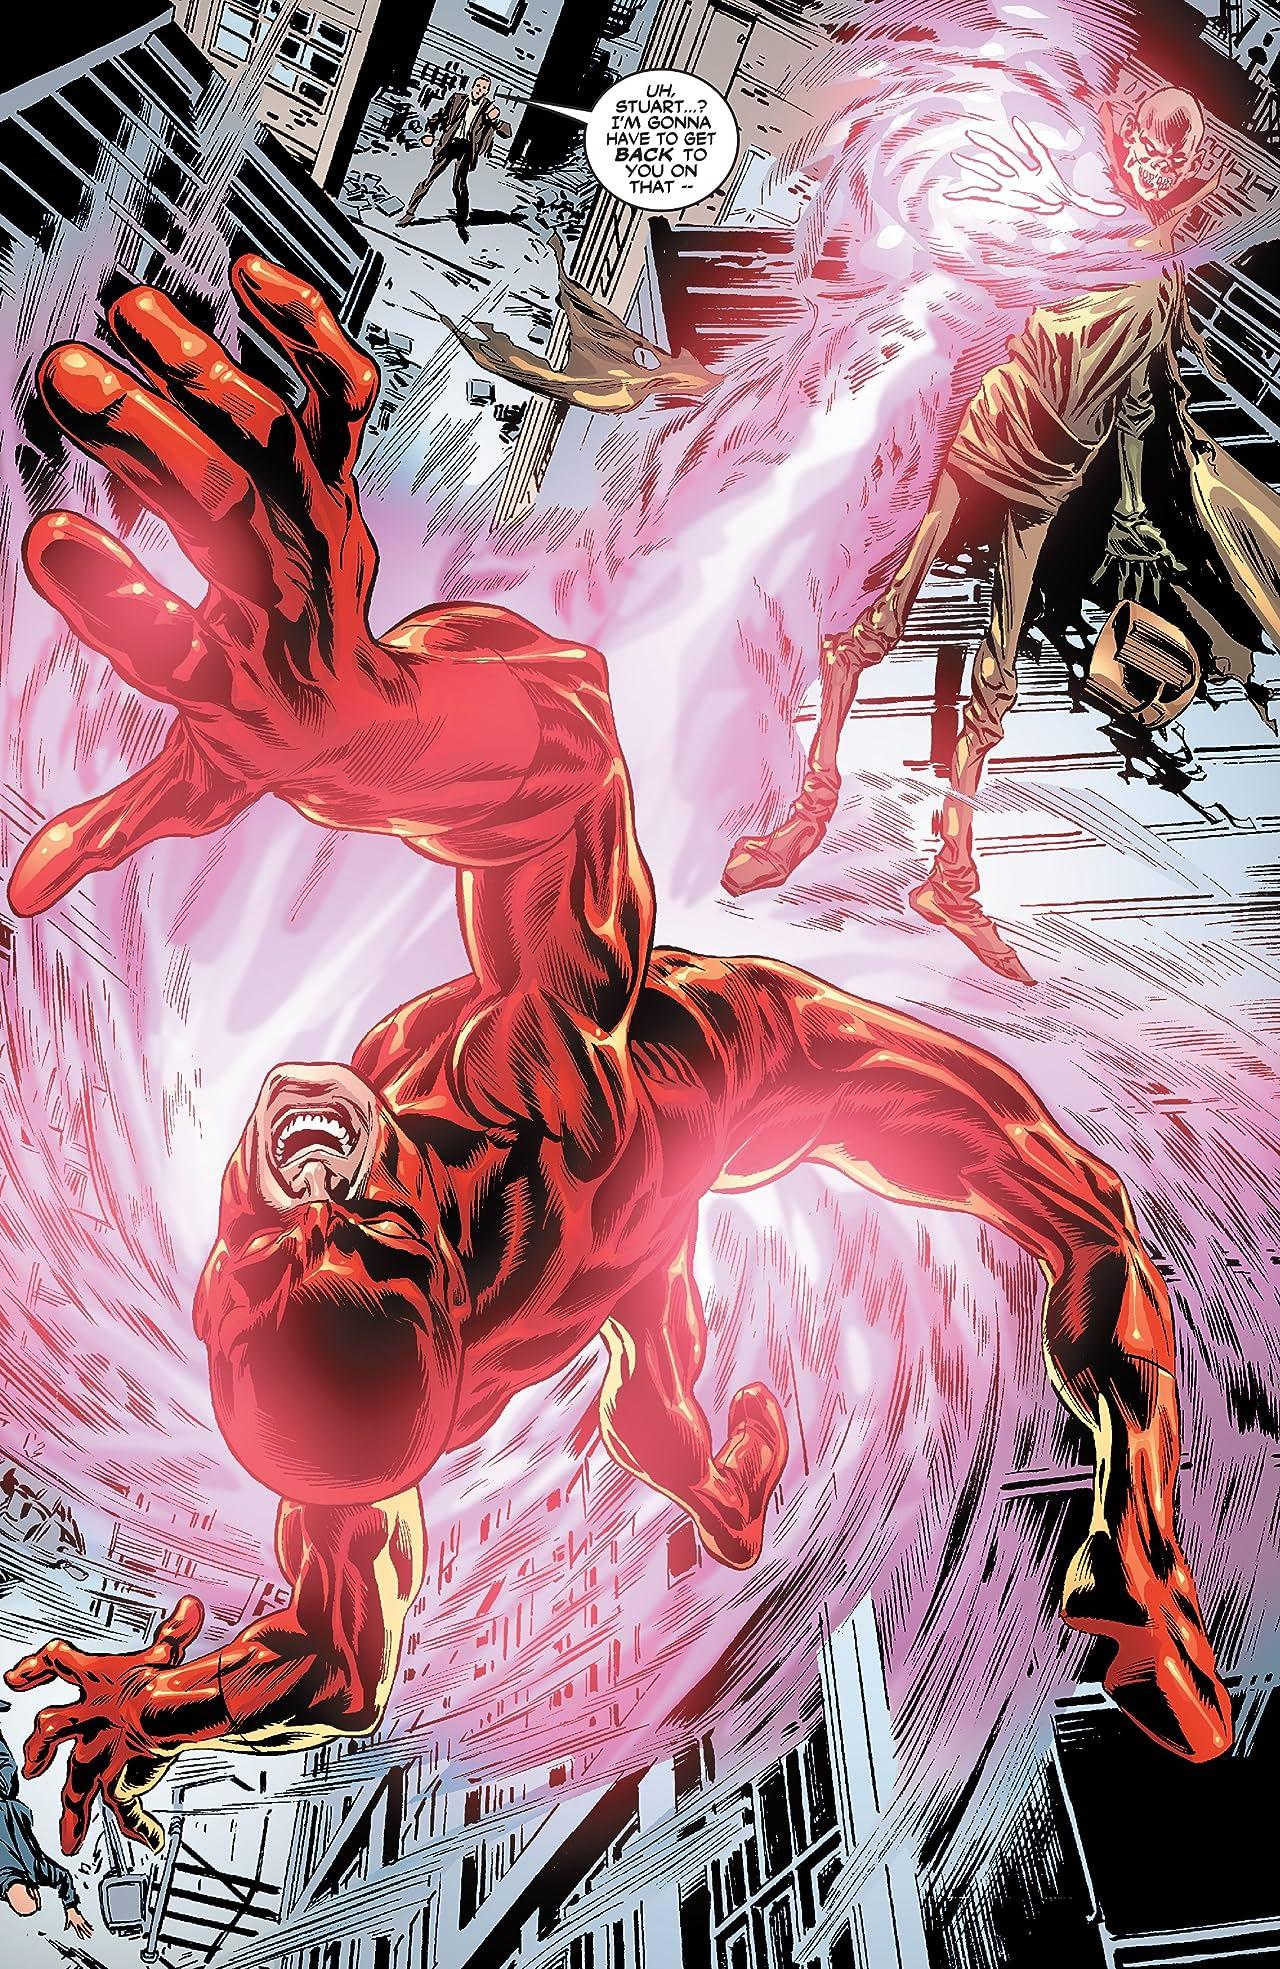 Daredevil/Spider-Man (2001) #4 (of 4)